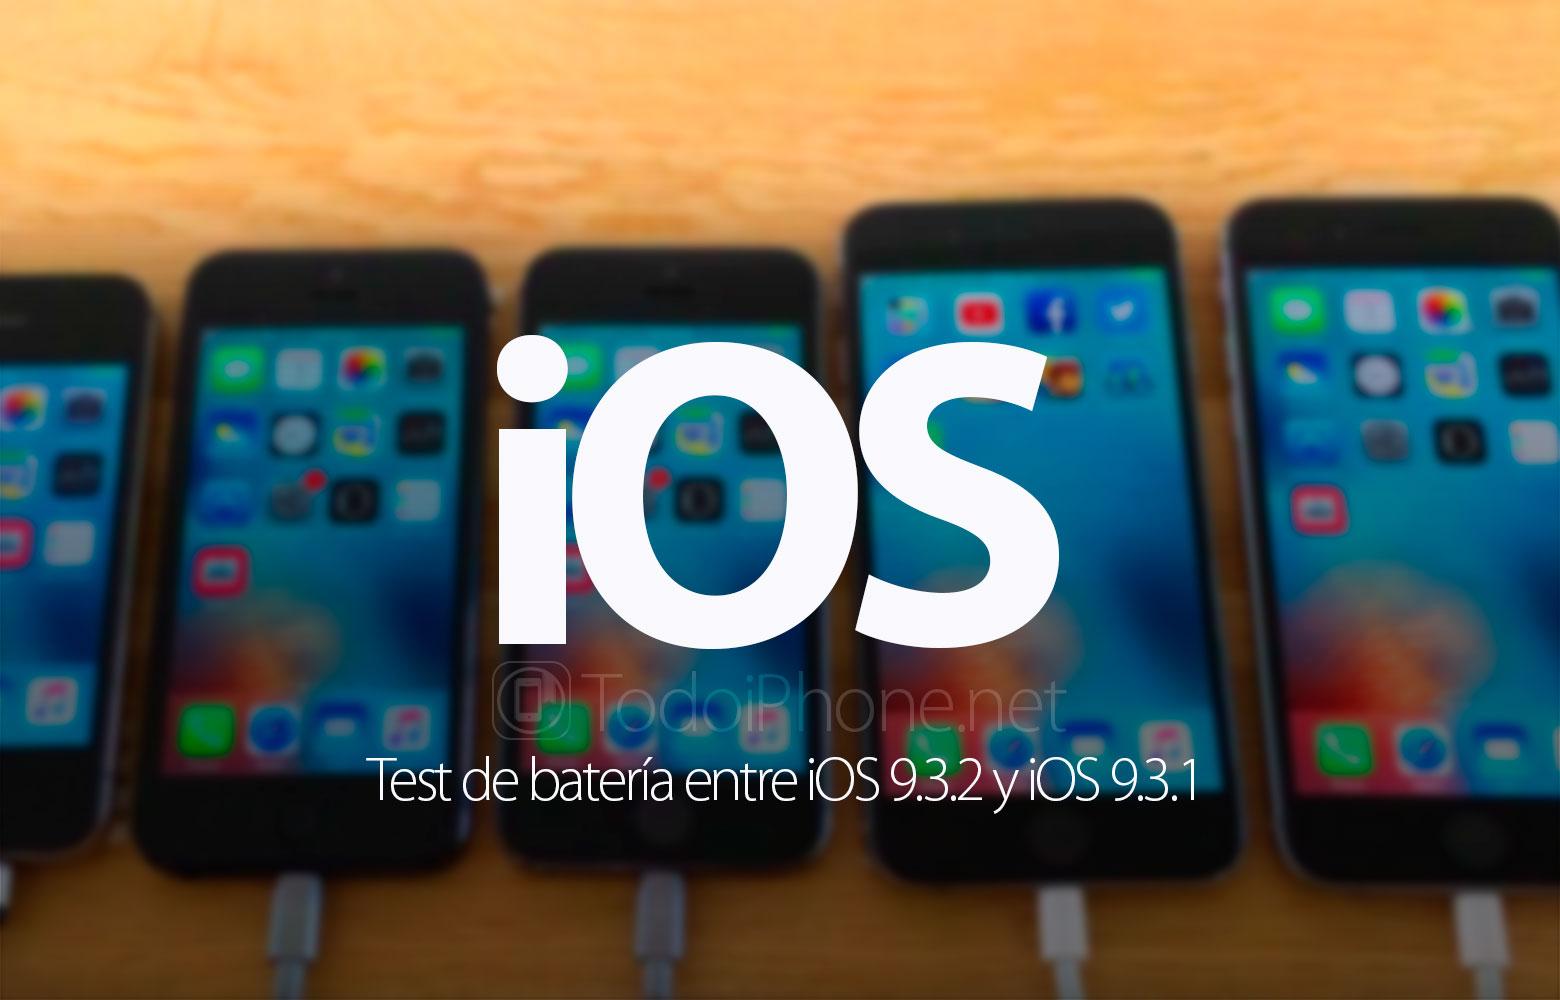 ios-9-3-2-vs-ios-9-3-1-test-bateria